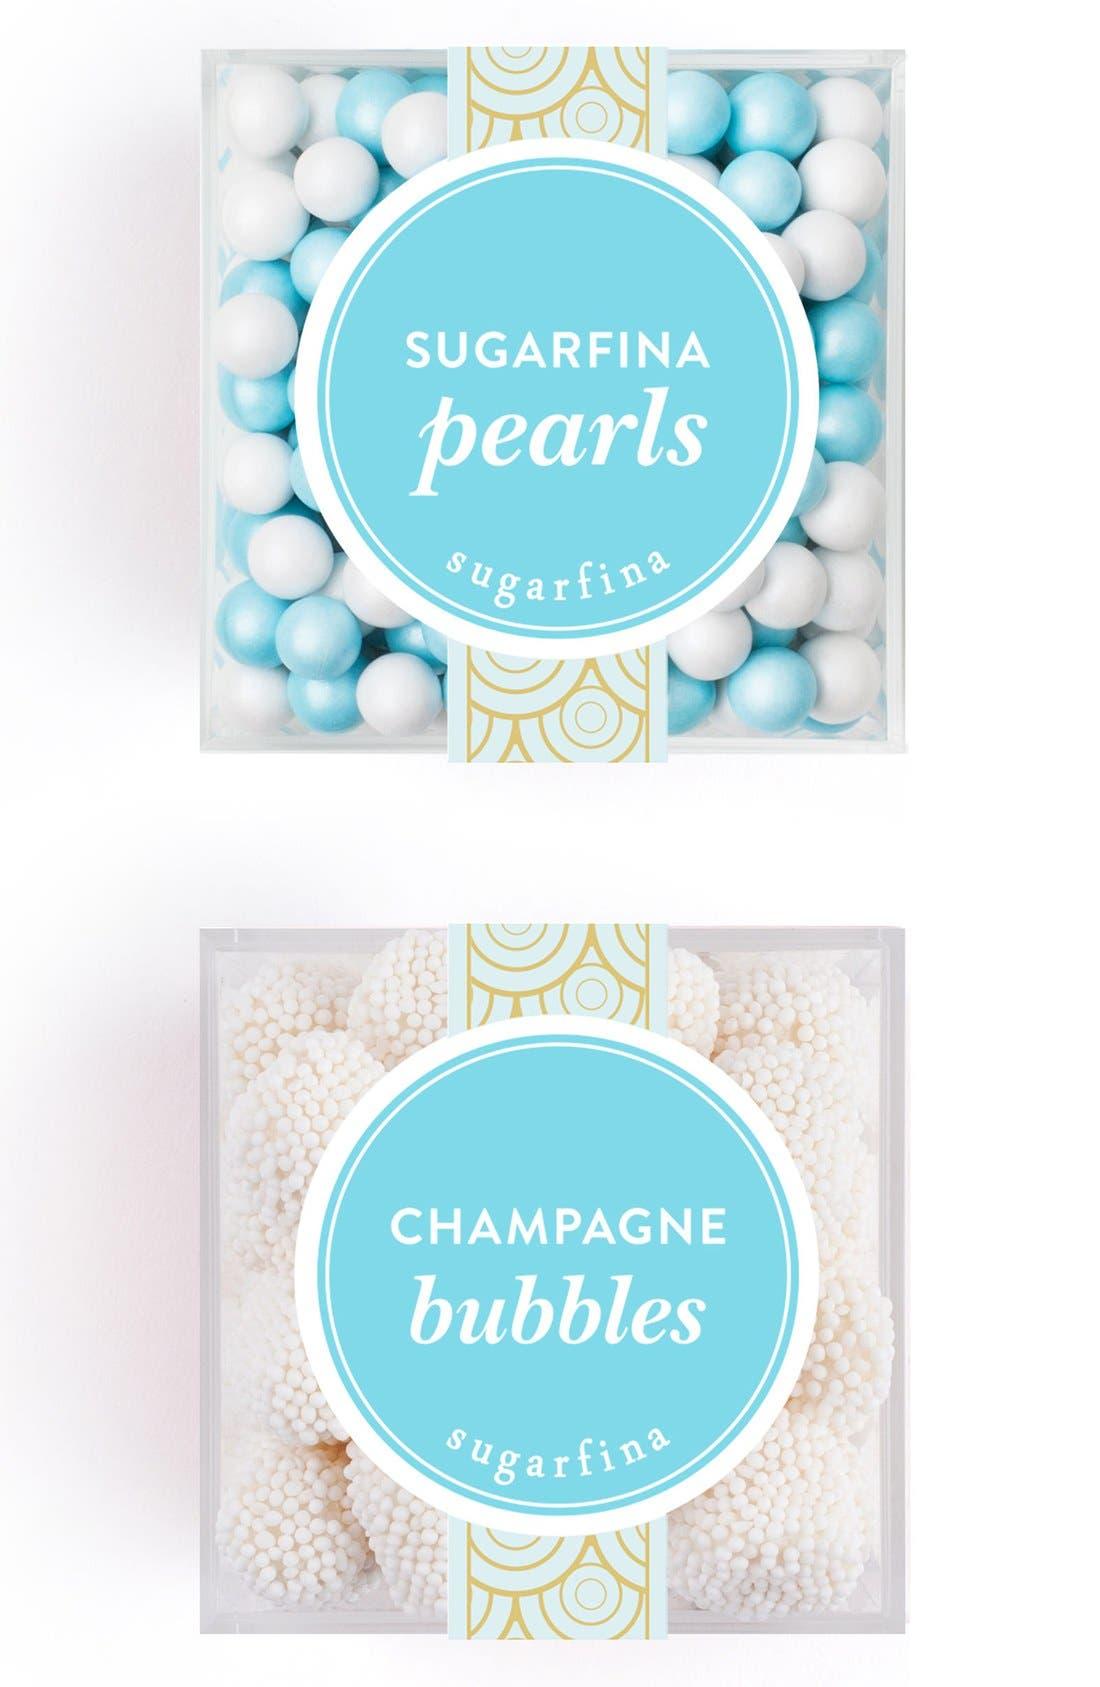 sugarfina Pearls & Champagne Bubbles Gift Box Set